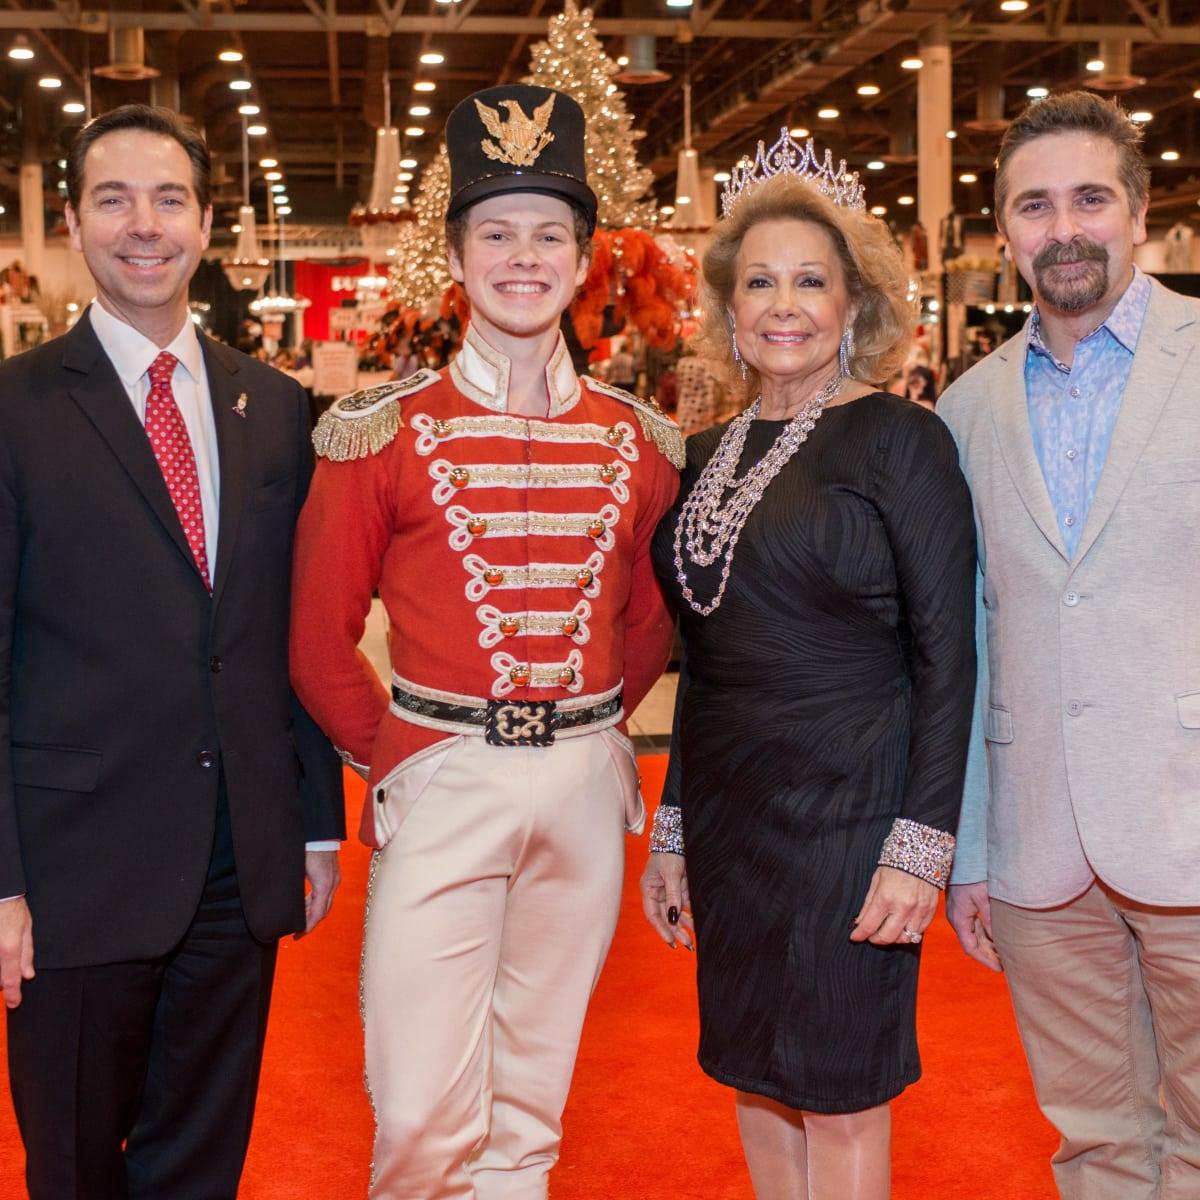 News, Shelby, Nutcracker Market, Nov. 2015, Jim Nelson, Philamena Baird, Stanton Welch